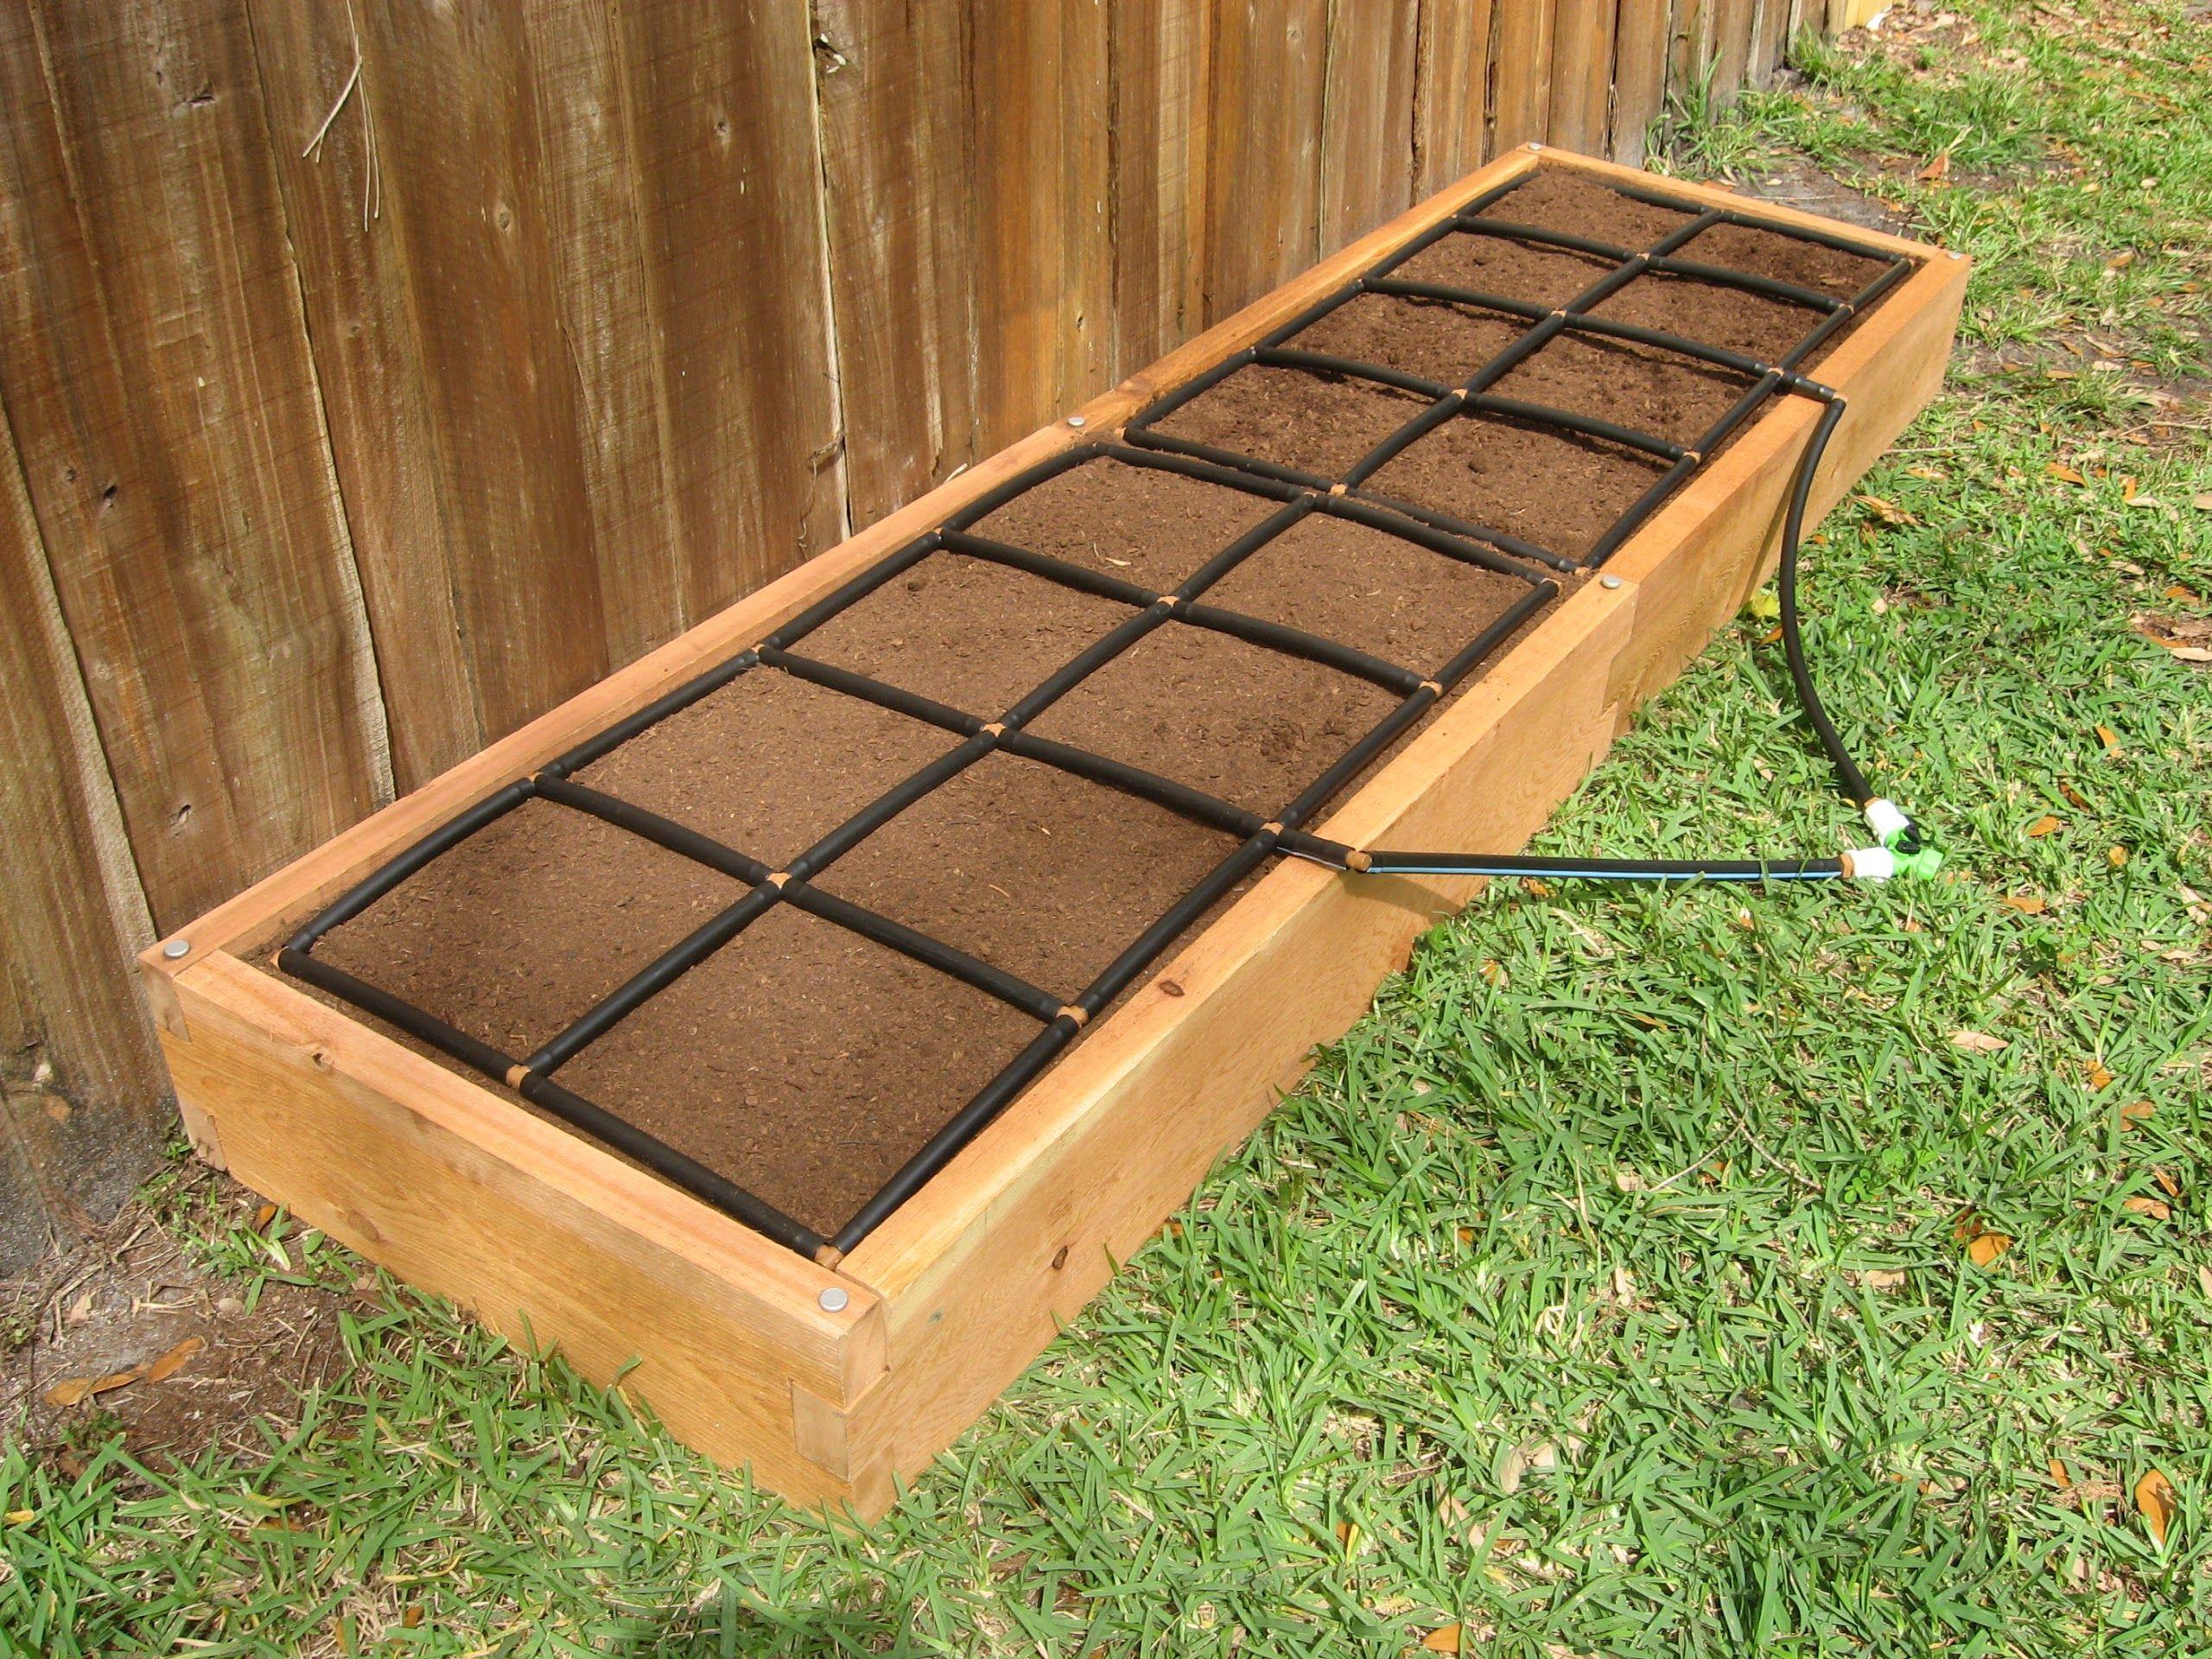 2x8 Raised Garden Kit w/ The Garden Grid™ Raised